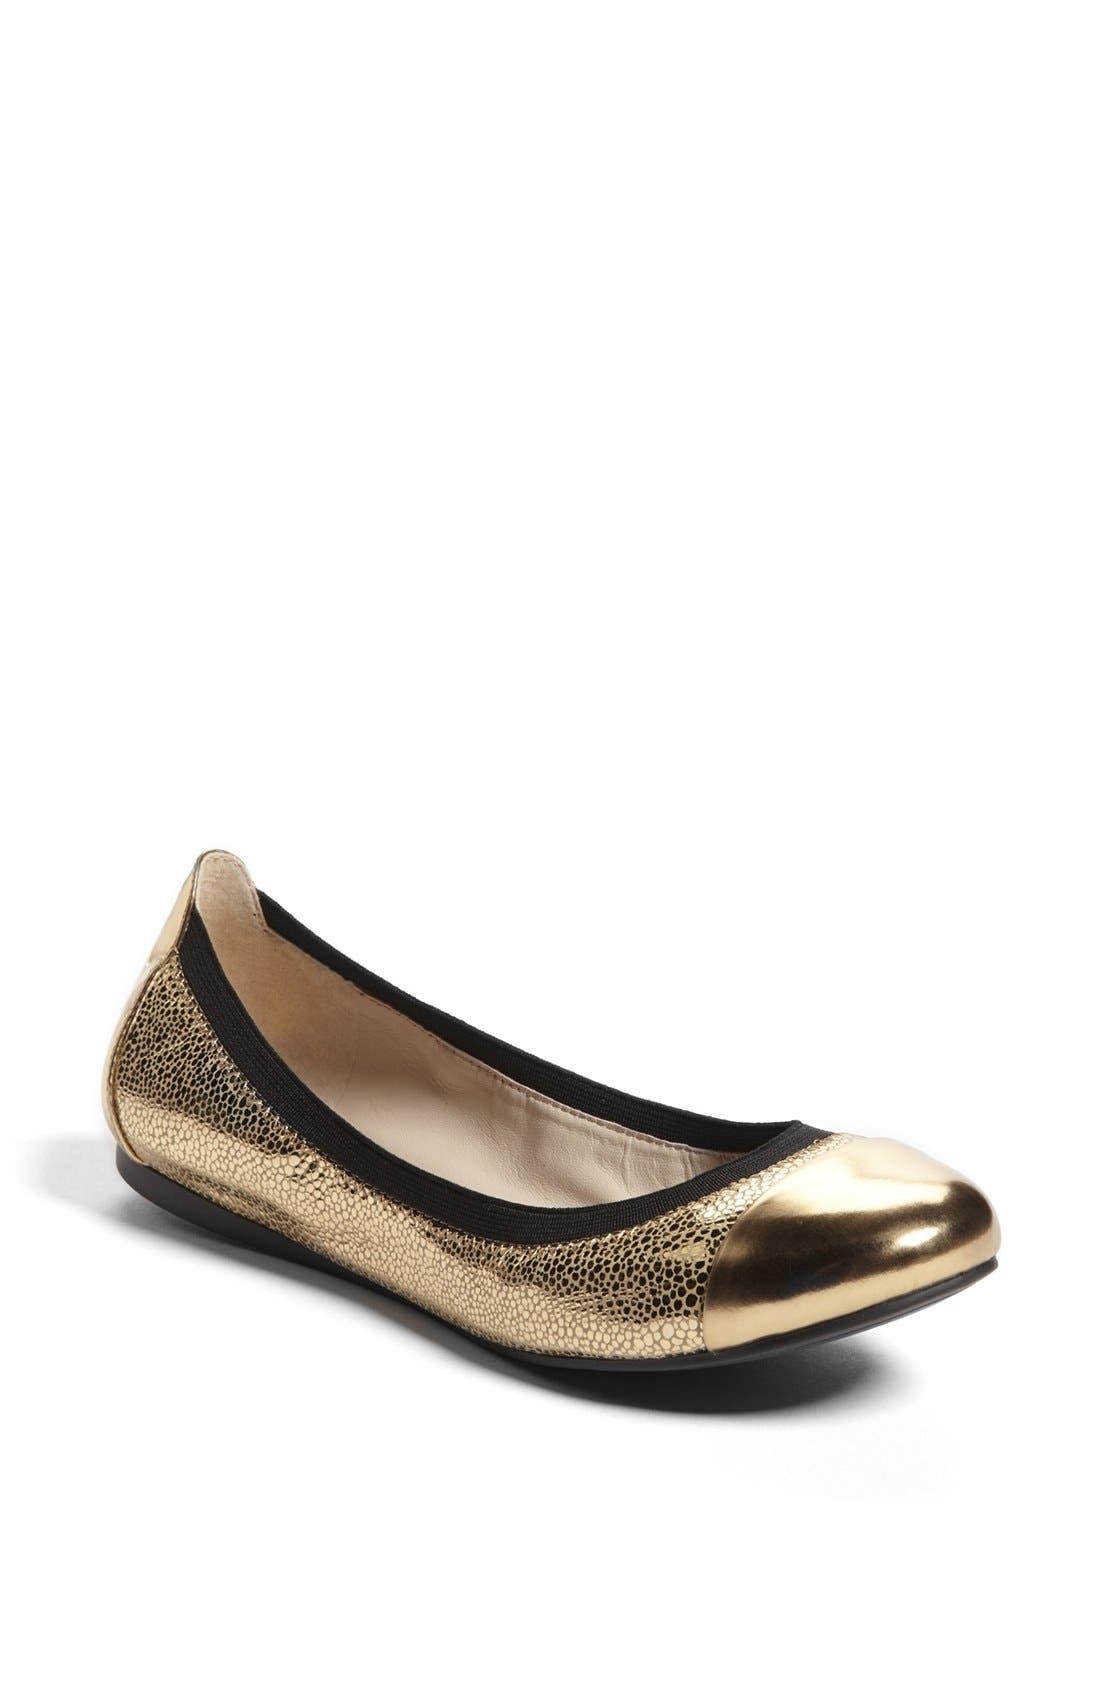 Alternate Image 1 Selected - Vince Camuto 'Elisee' Leather Ballet Flat